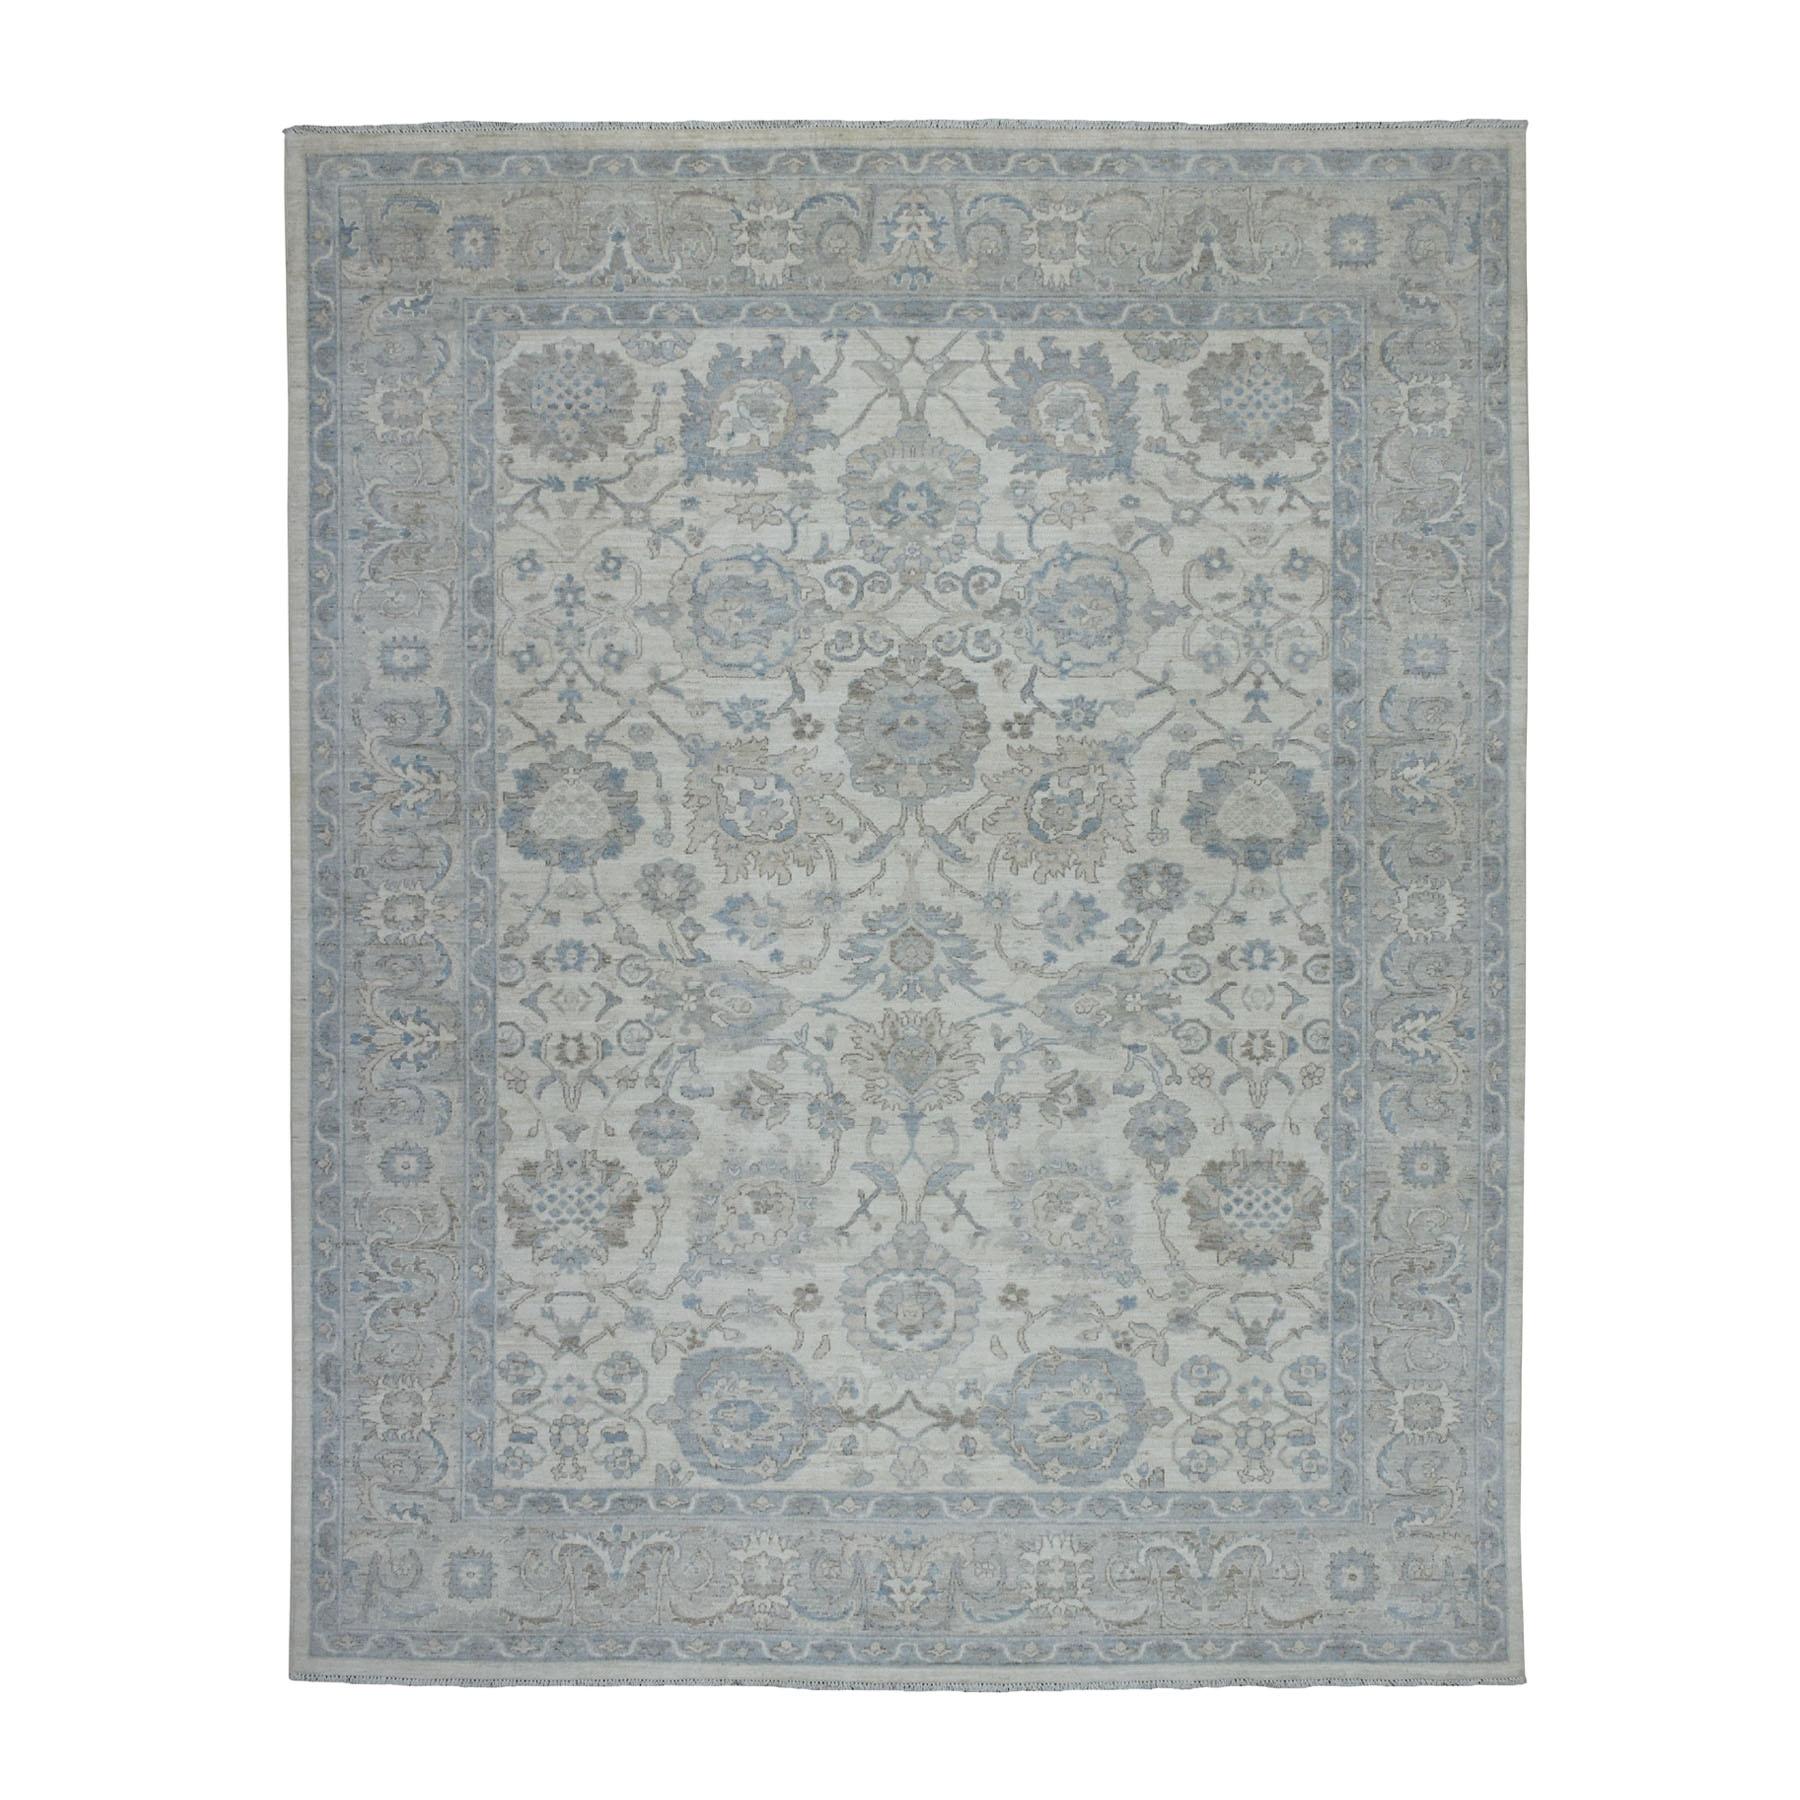 "7'10""x10'  White Wash Peshawar Ziegler Mahal Design Hand Knotted Oriental Rug"